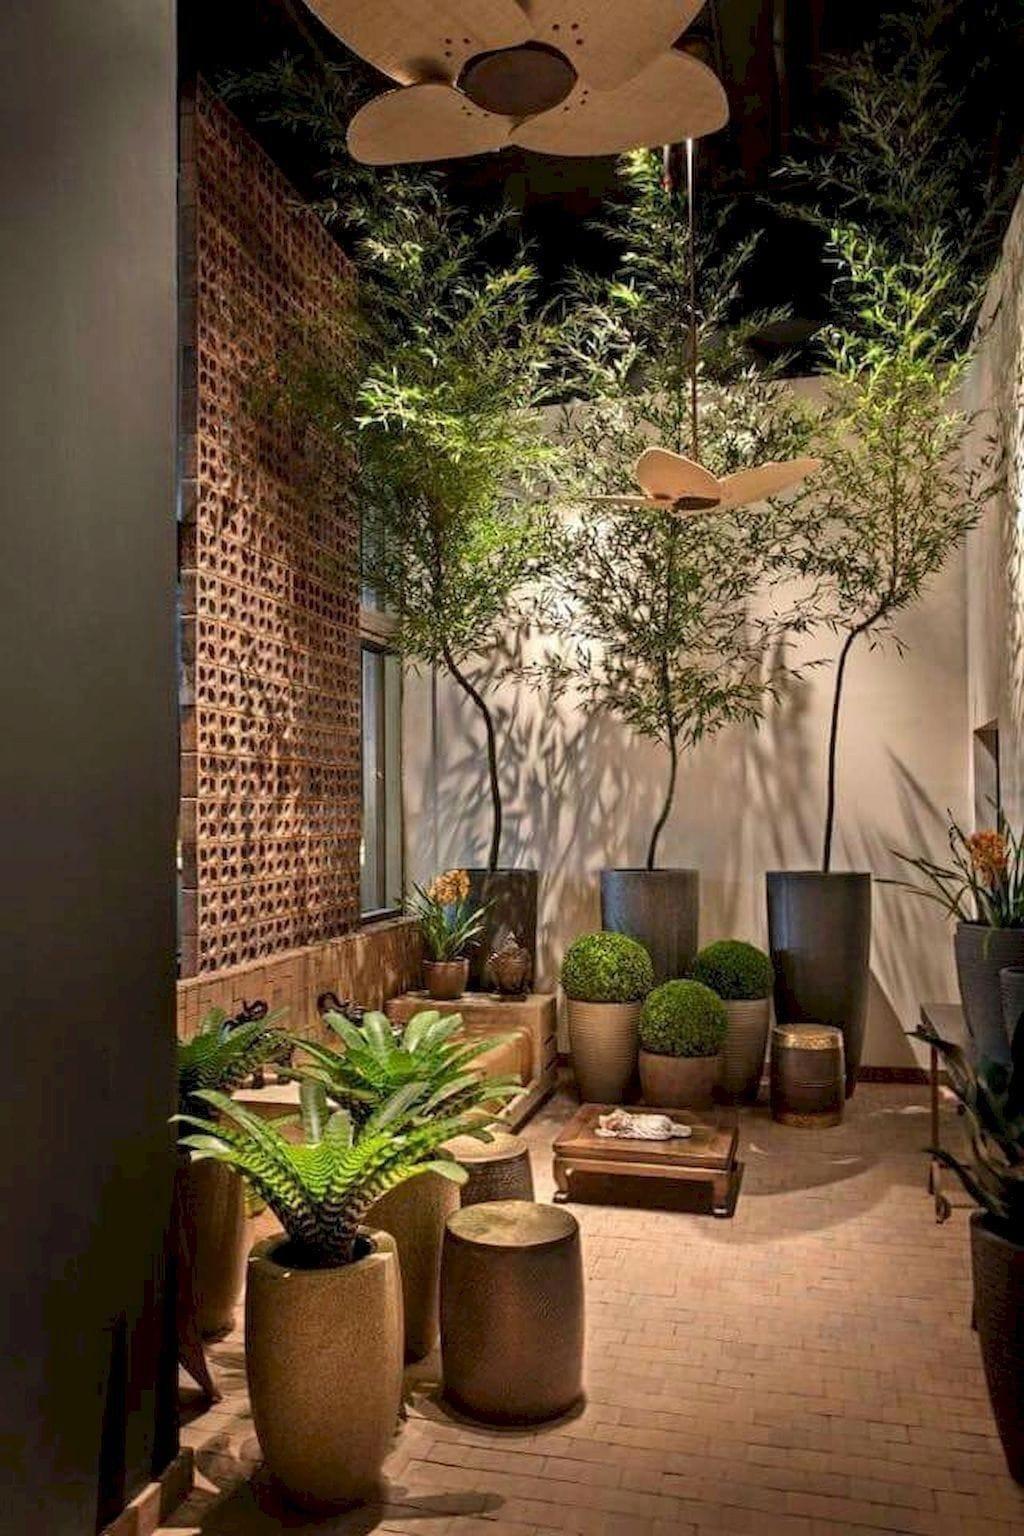 DIY Niche Decor Entryway Ideas 13 - DECOREDO